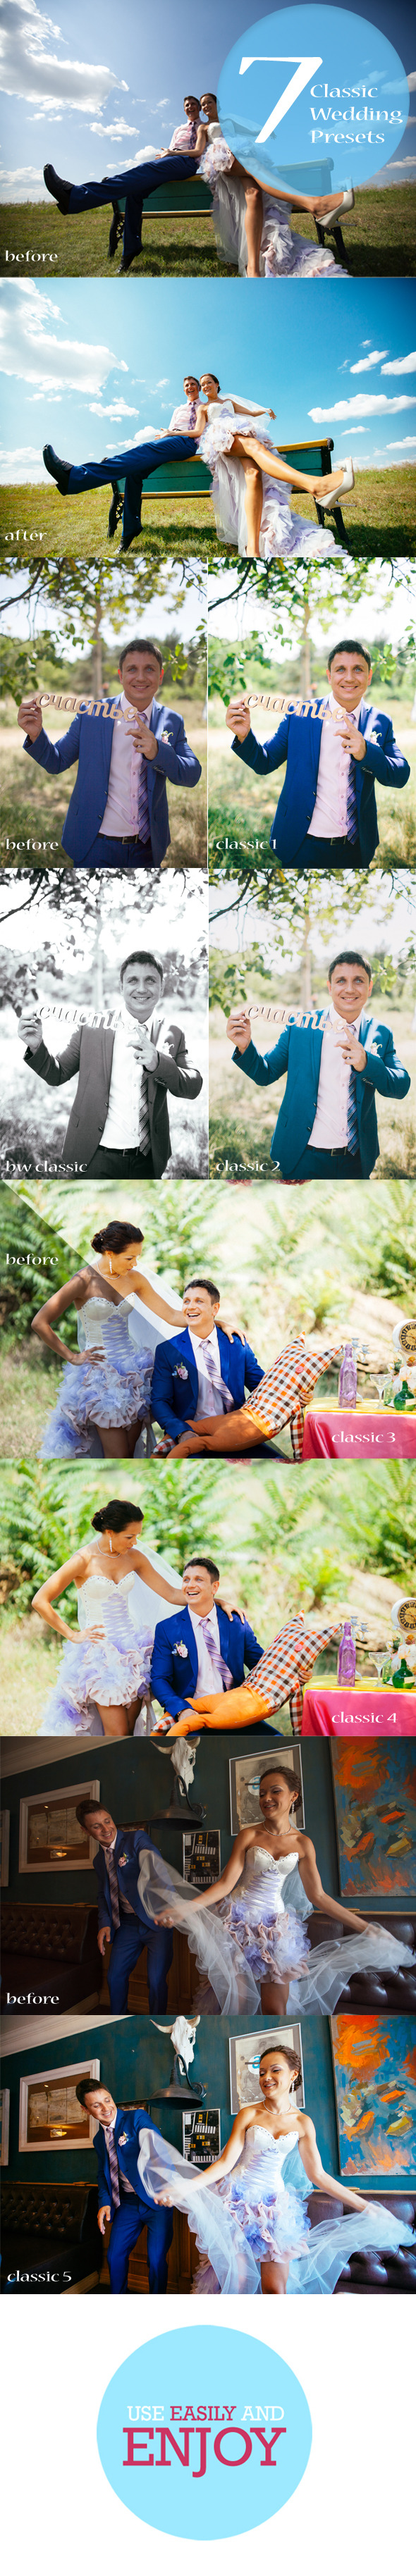 GraphicRiver 7 Wedding Valentine Presets 10302699